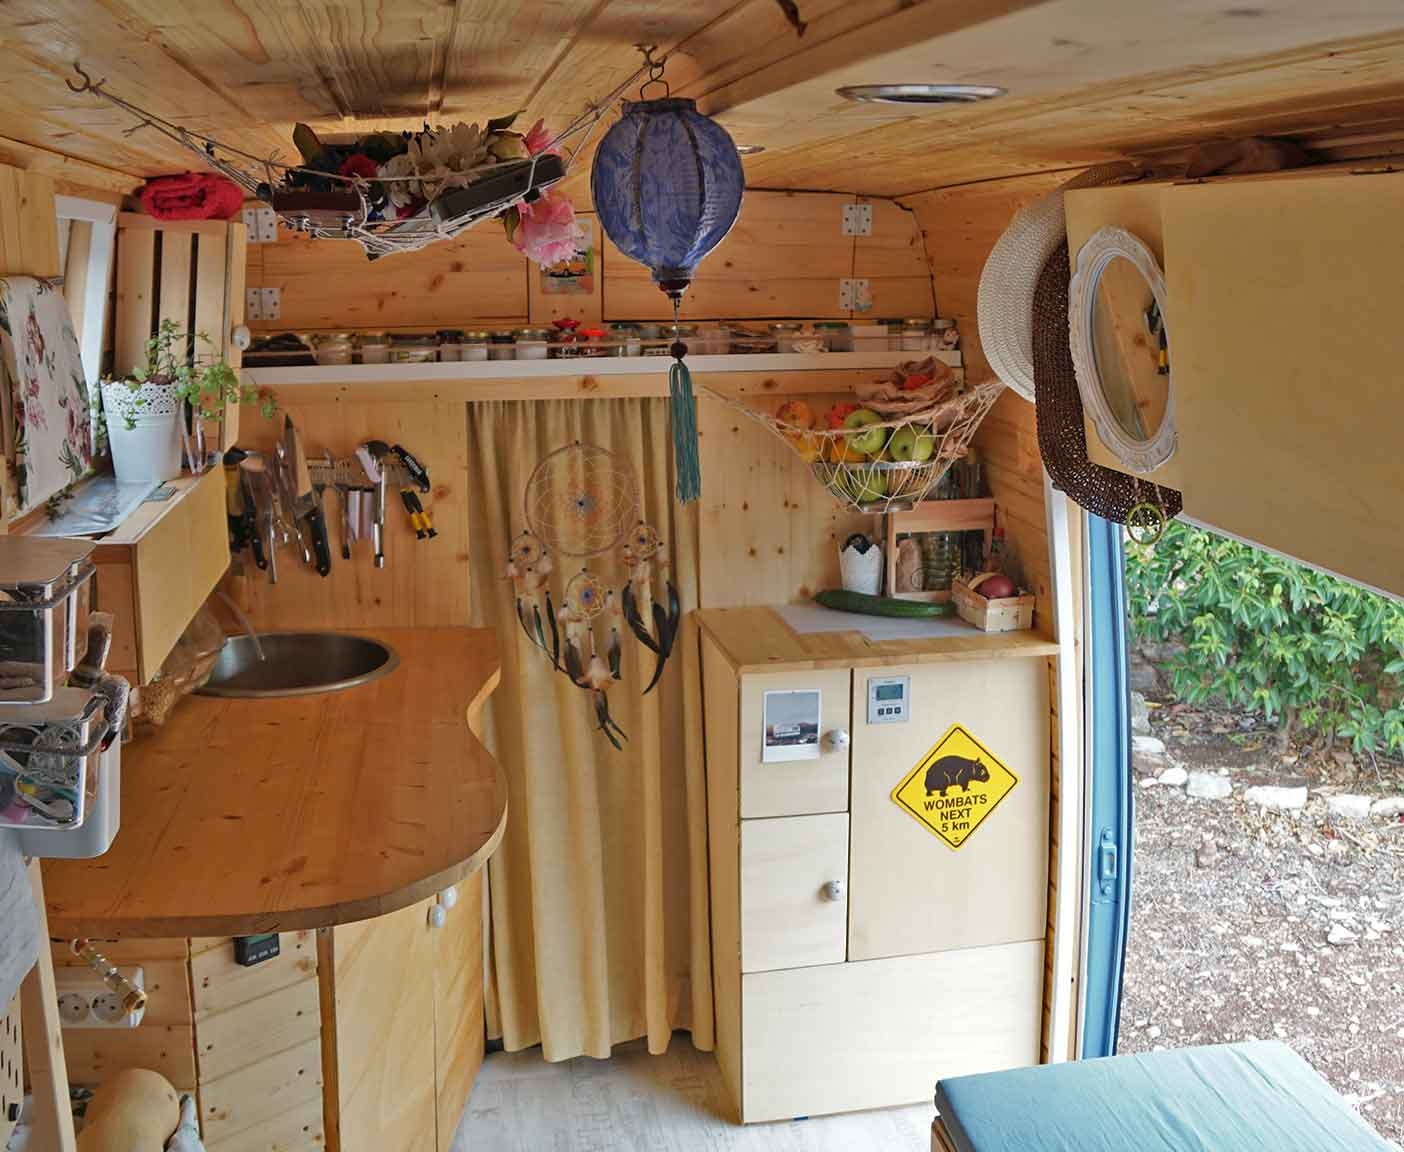 camper-selbstausbau-vw-ltg-28-camper.jpg